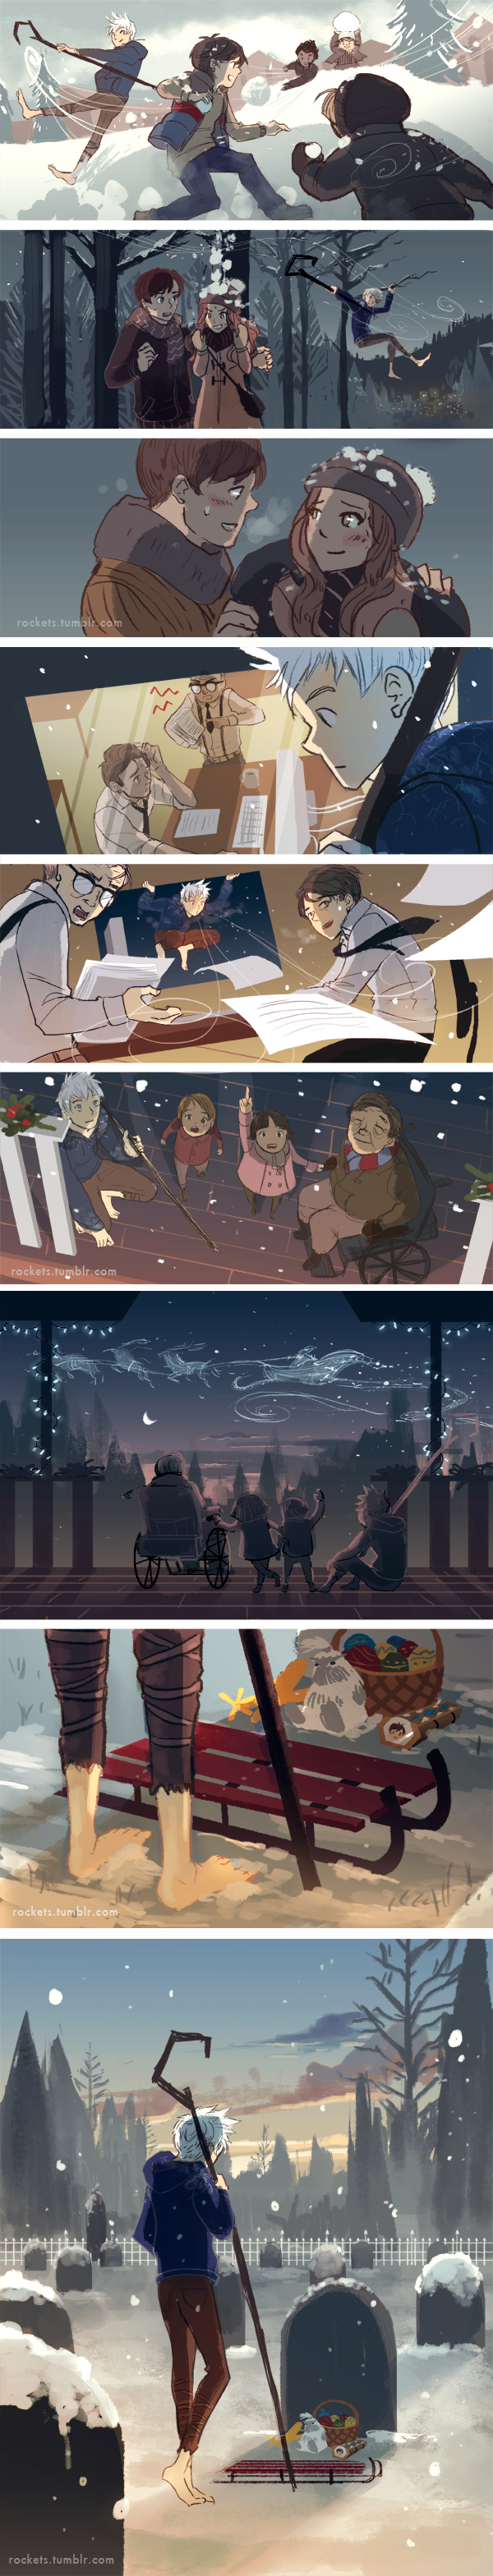 Tags: Anime, Hakuku, Rise of the Guardians, Jamie Bennett, Fan Character, Jack Frost, Throwing, Graveyard, Wheelchair, Wheel, Snowball, Paperwork, Comic